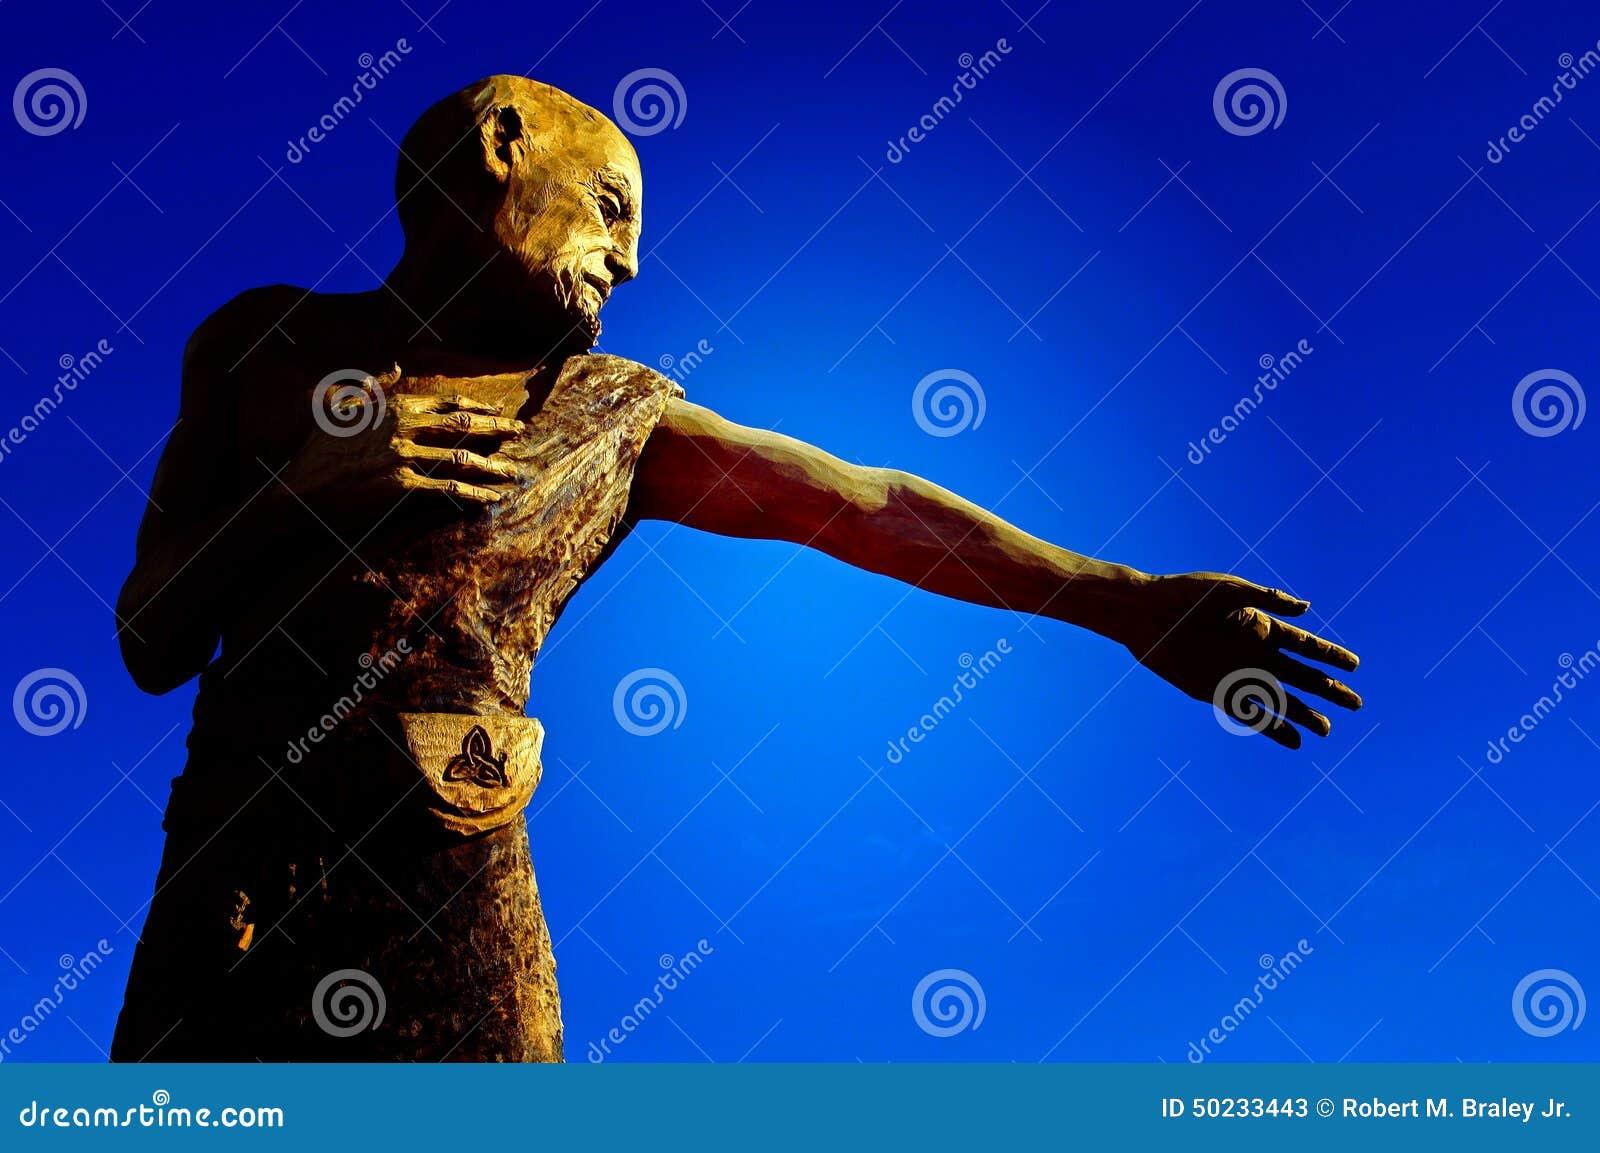 Human Chain Saw Carving